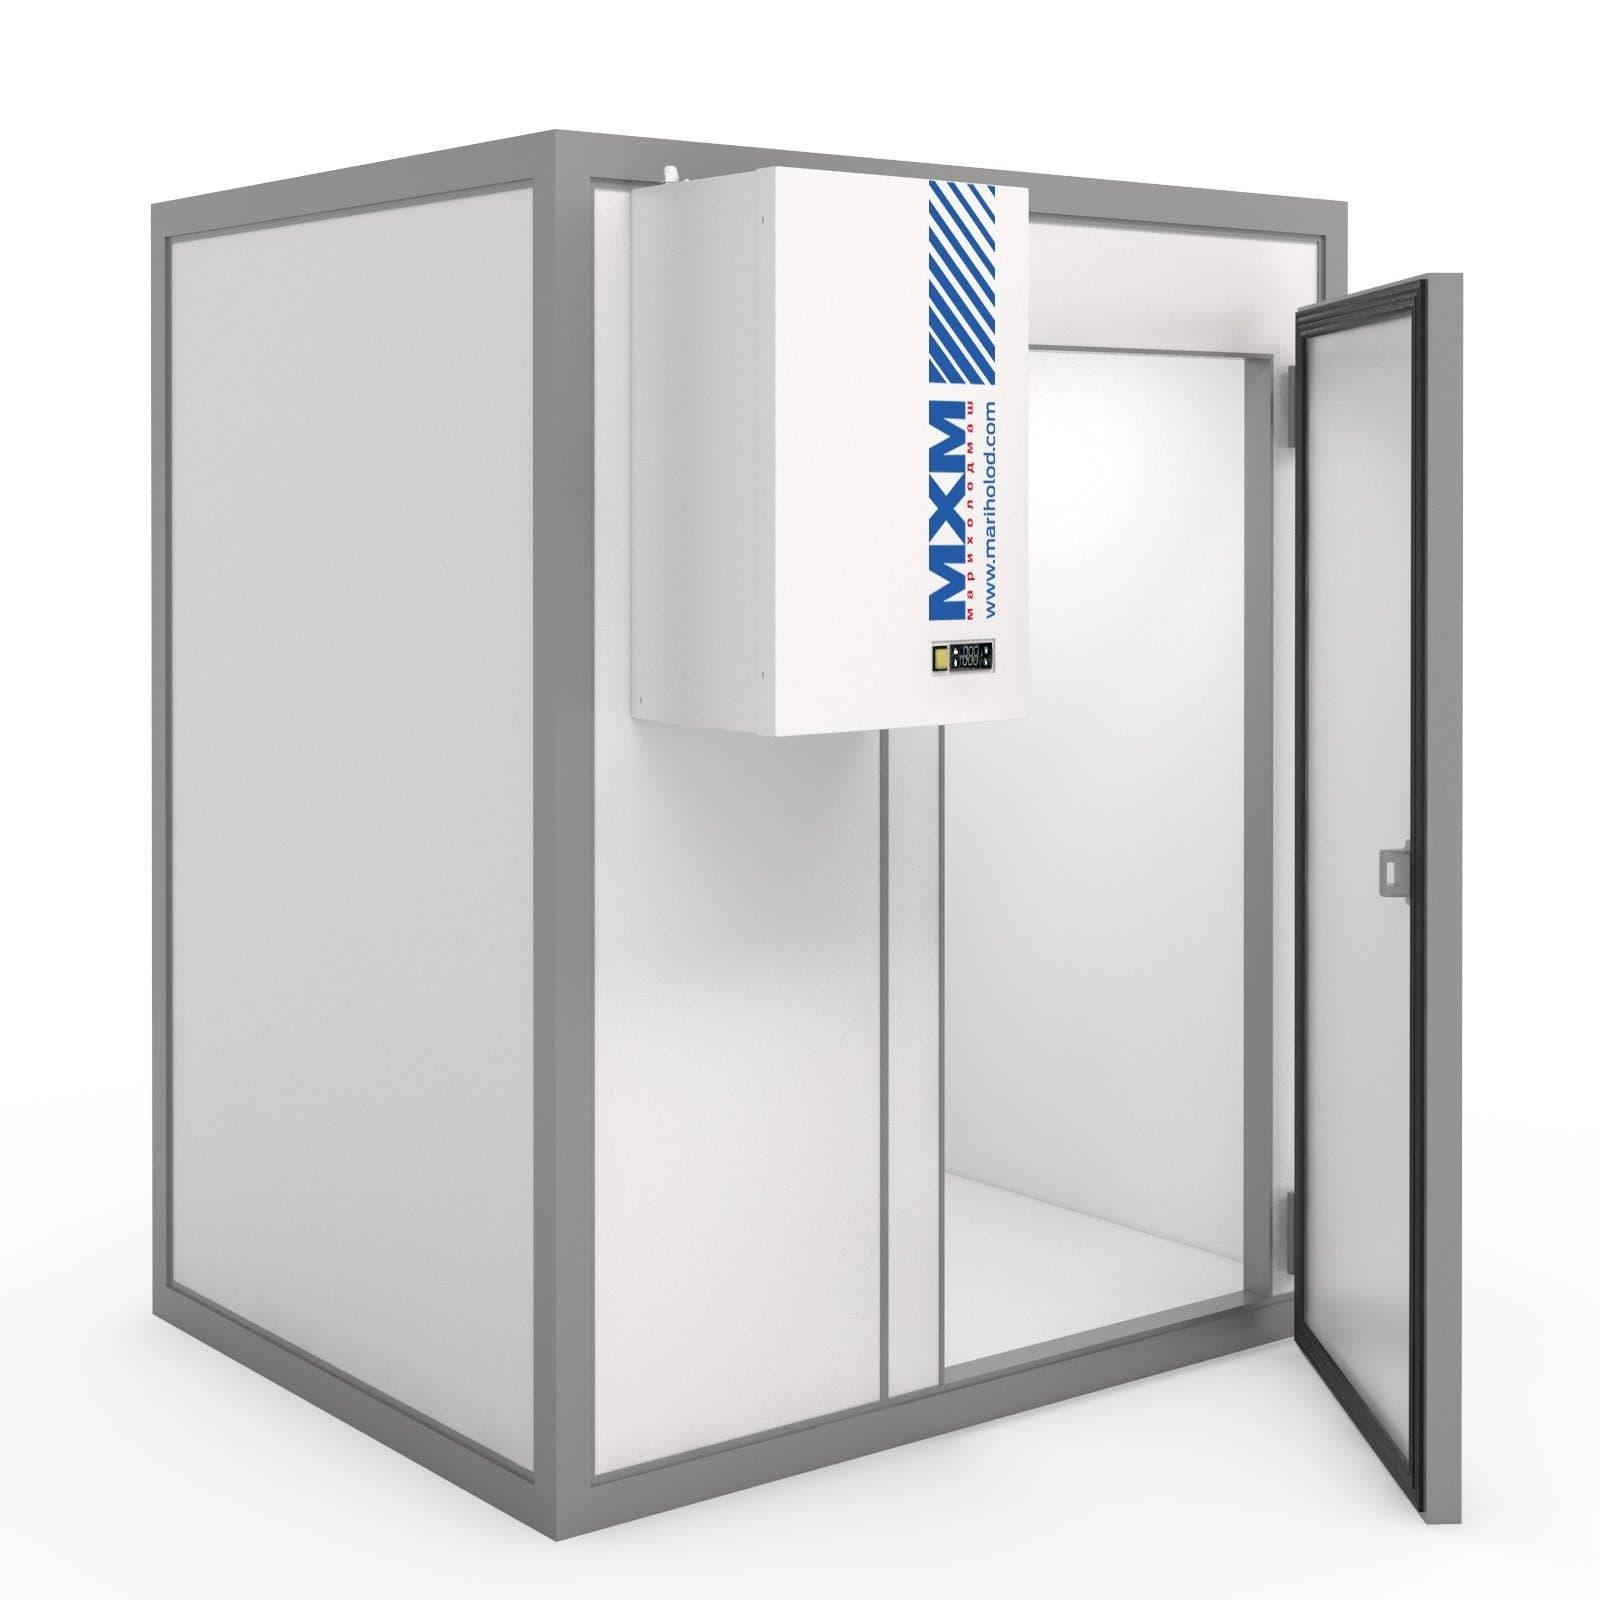 Камера холодильная КХН-89,42 (2560×16360×2460 мм)